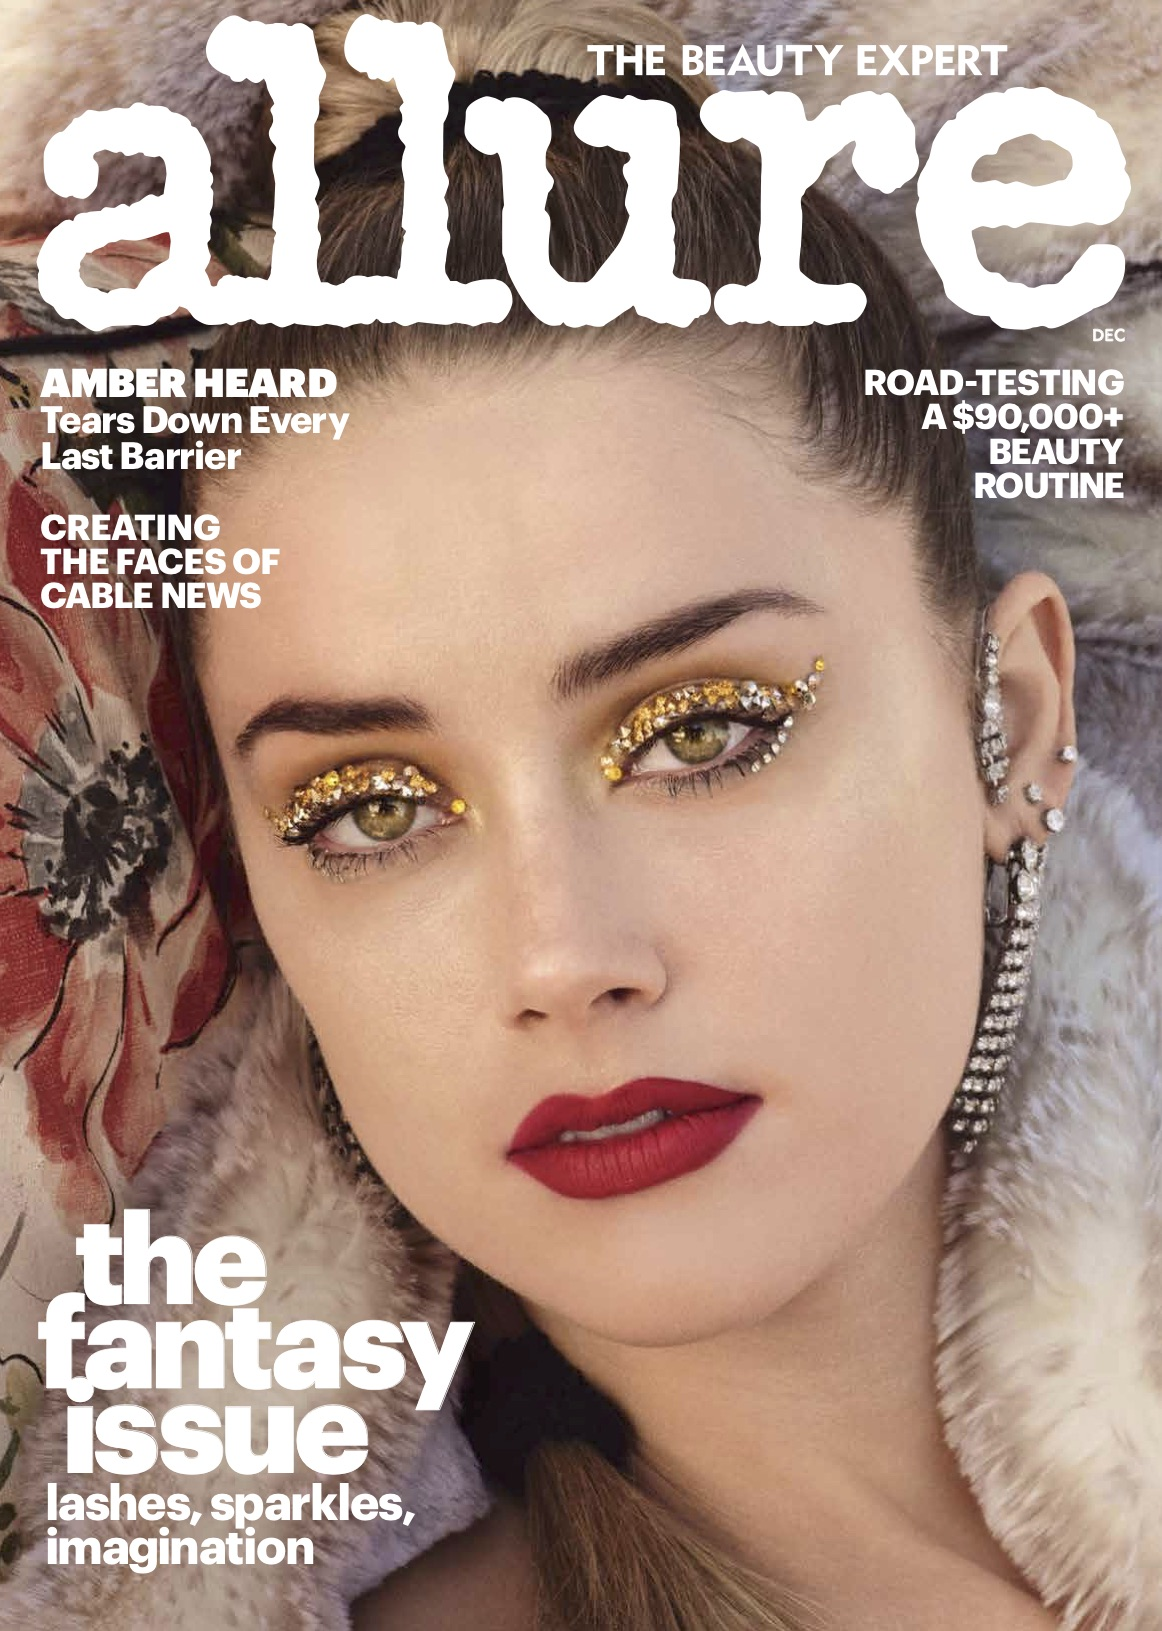 Allure DEC 17 - Cover - Amber Heard copy.jpg